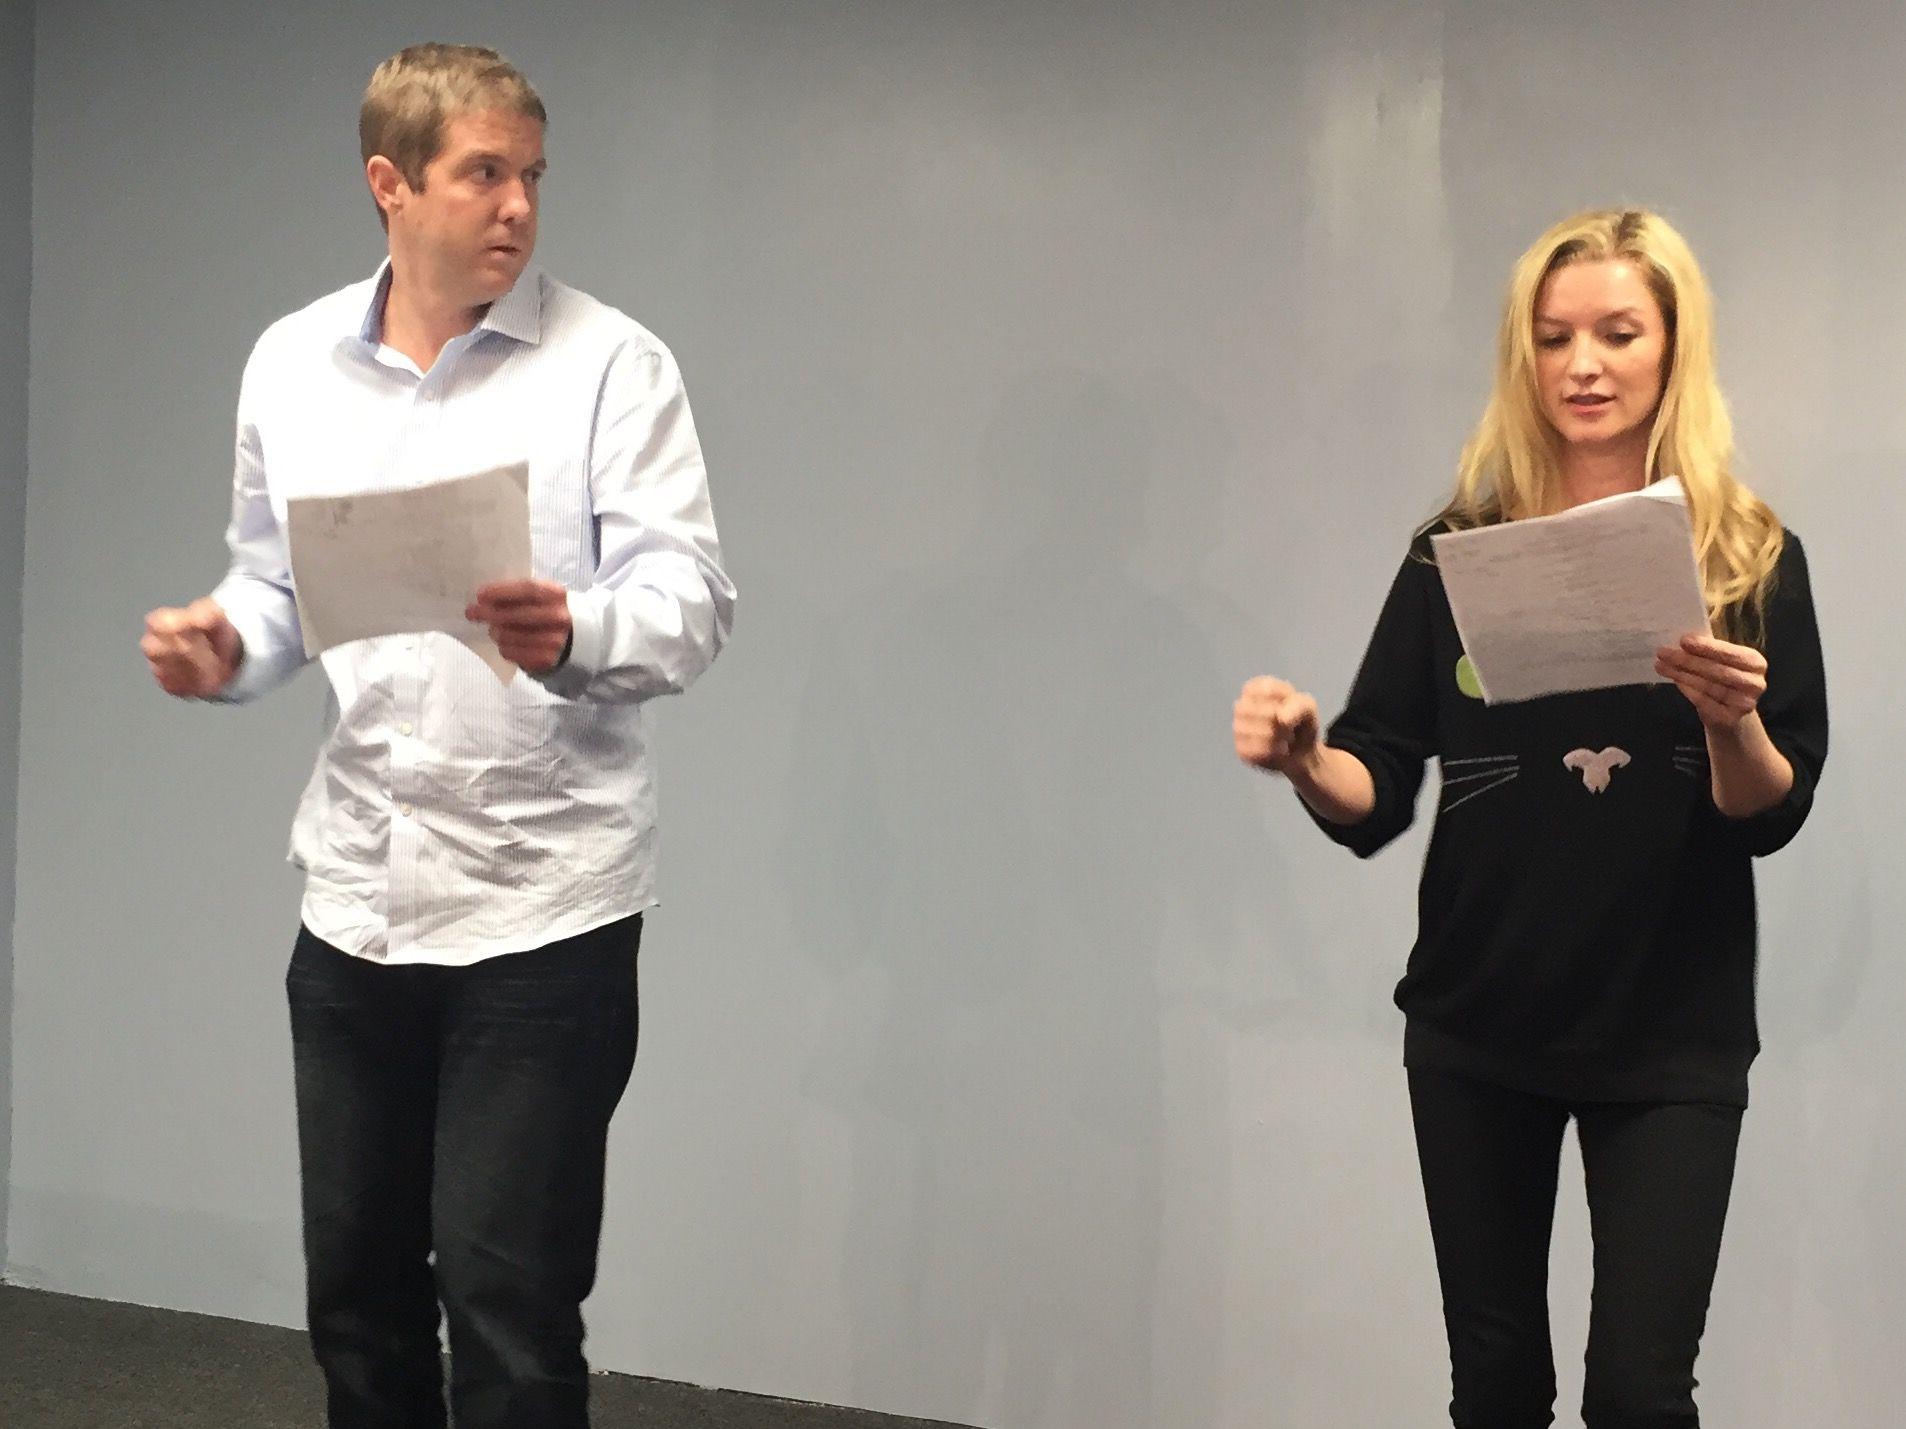 Best Acting school los angeles, Audition technique Los